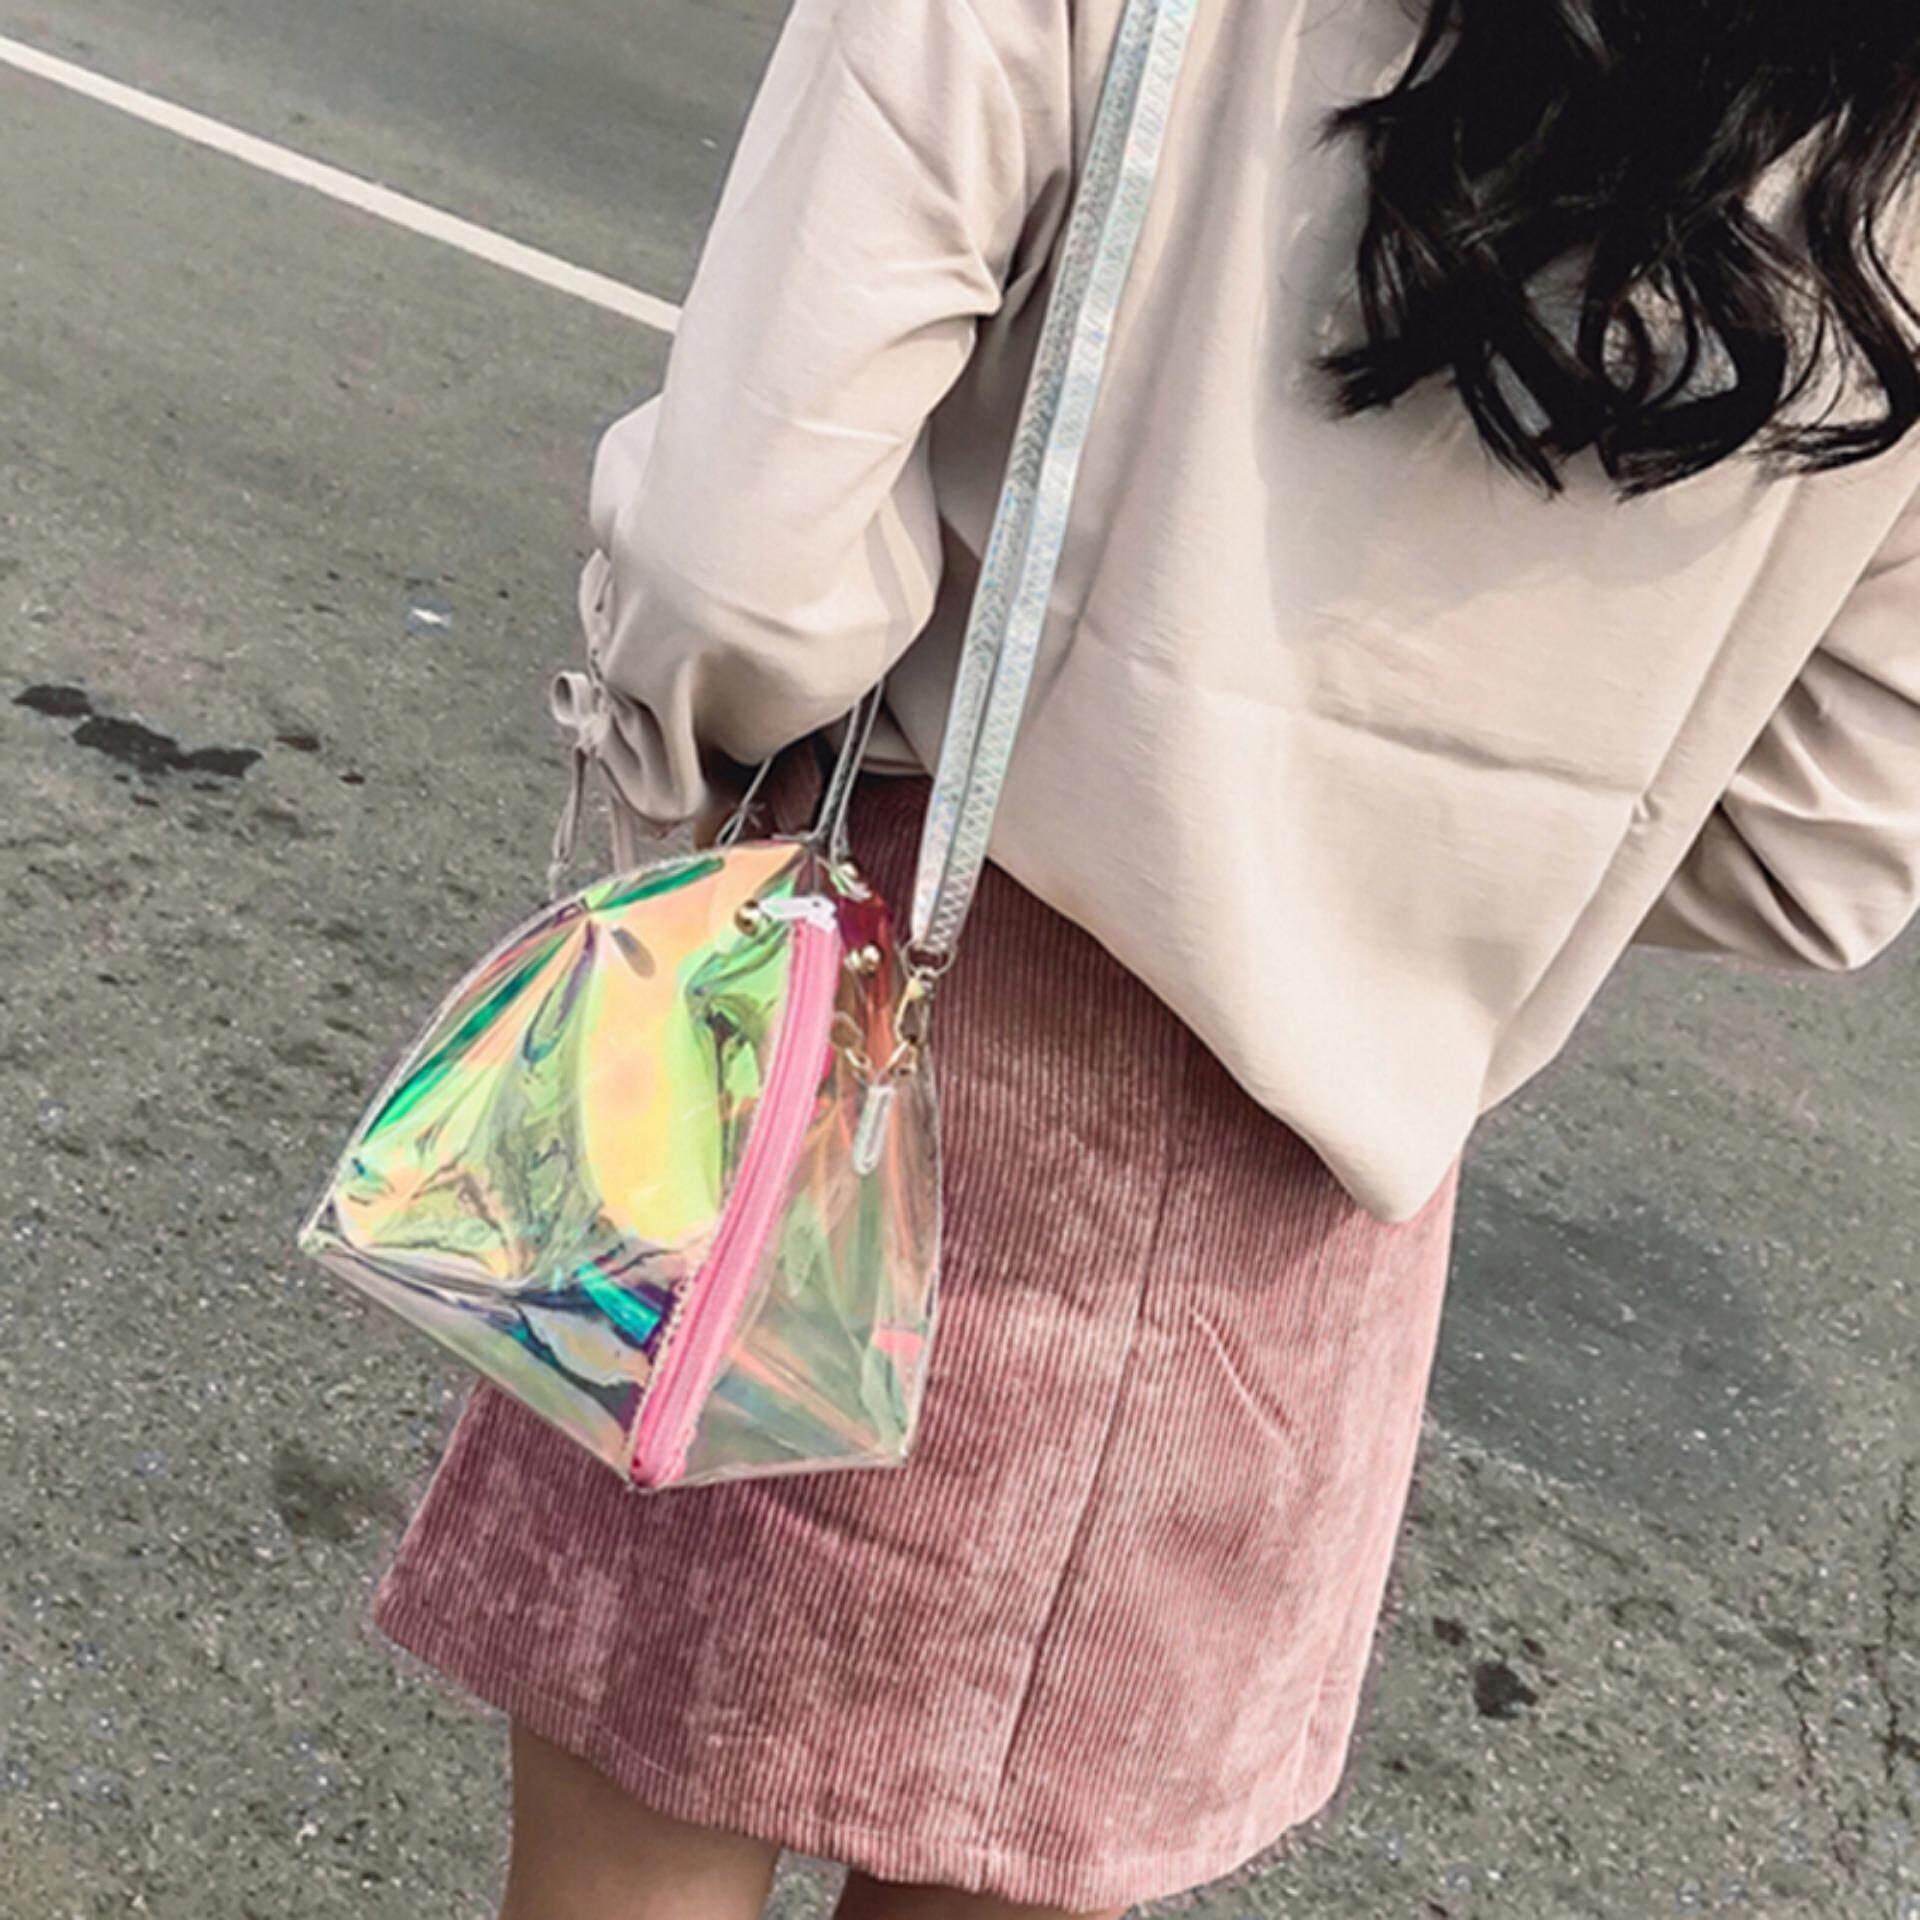 Mini Wanita Jelas Tas Tangan PVC Transparan Tas Belanja Musim Panas Pantai Shouler Tas